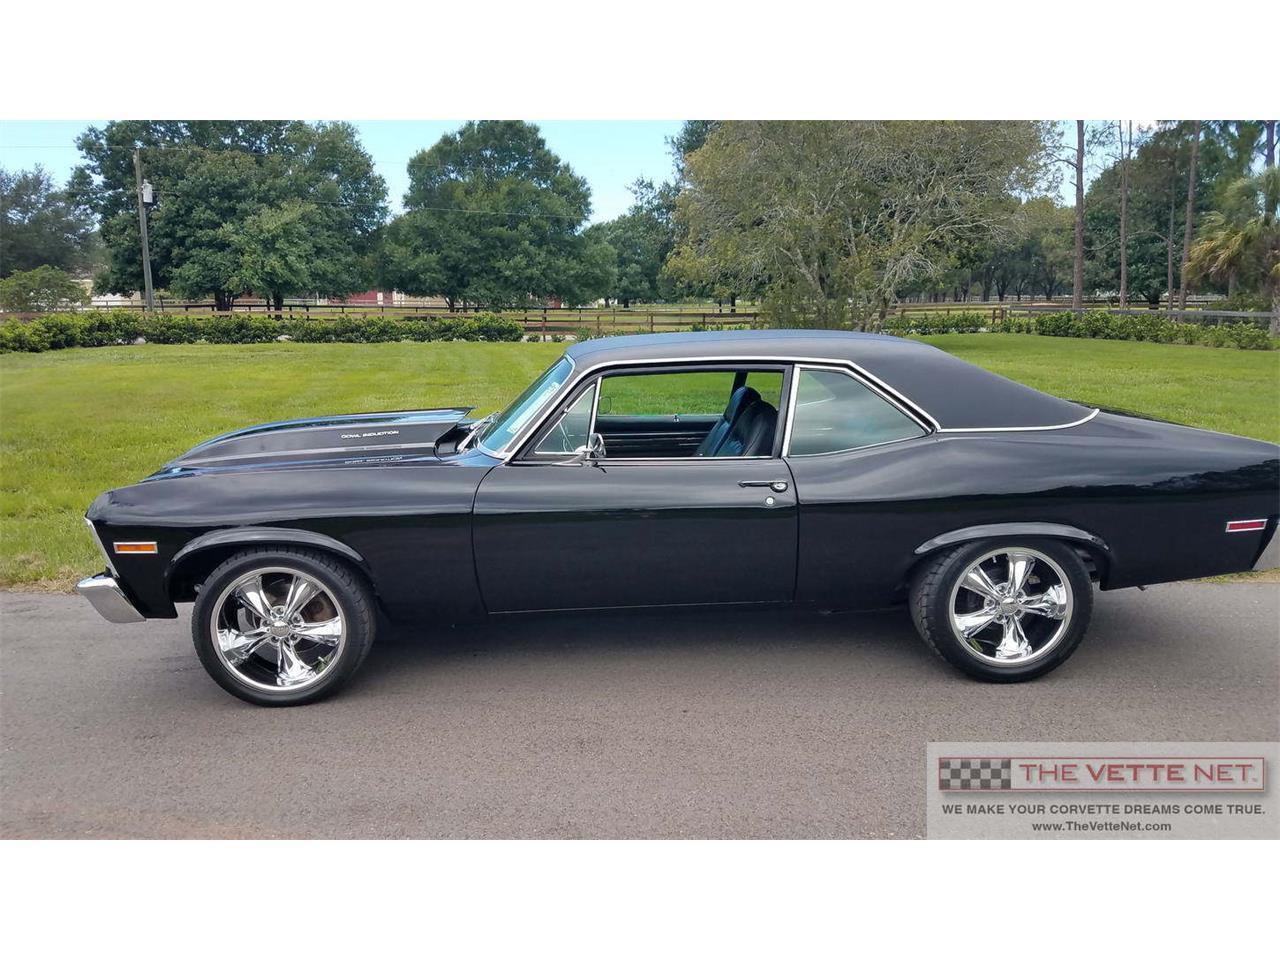 Large Picture of Classic 1972 Chevrolet Nova located in Sarasota Florida - $25,990.00 - LCBP